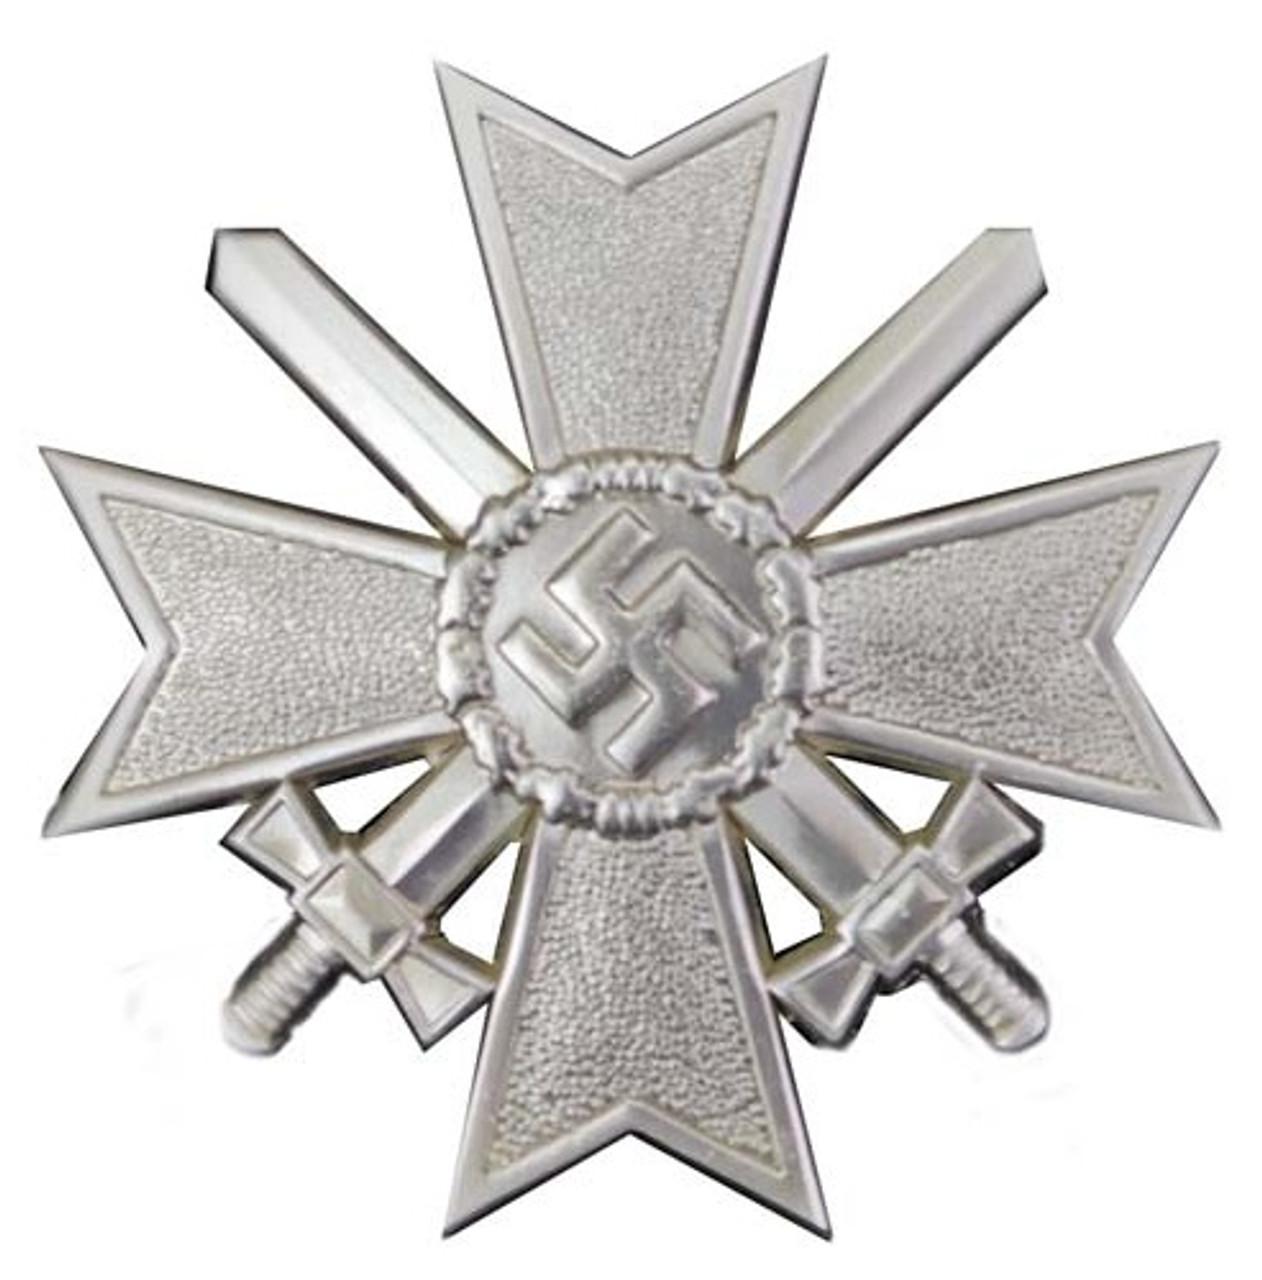 WWII War Merit Cross Medal With Swords from Hessen Antique